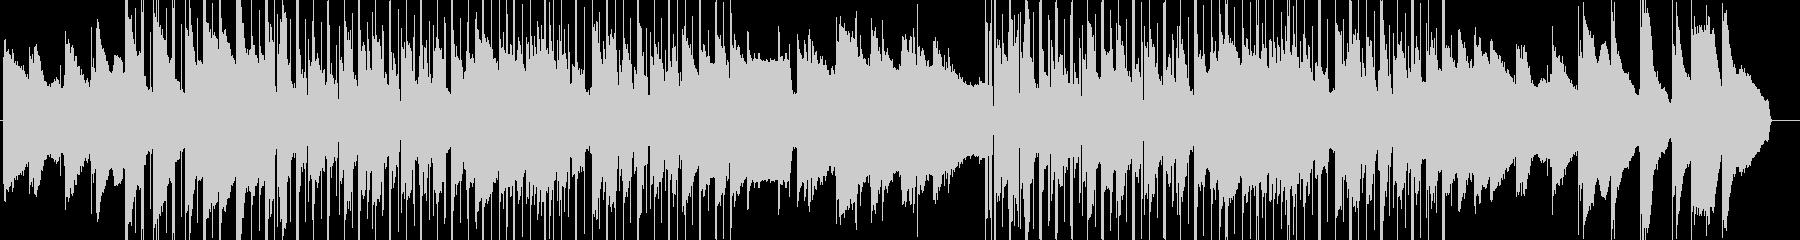 lofi風やさしいピアノのBGMの未再生の波形